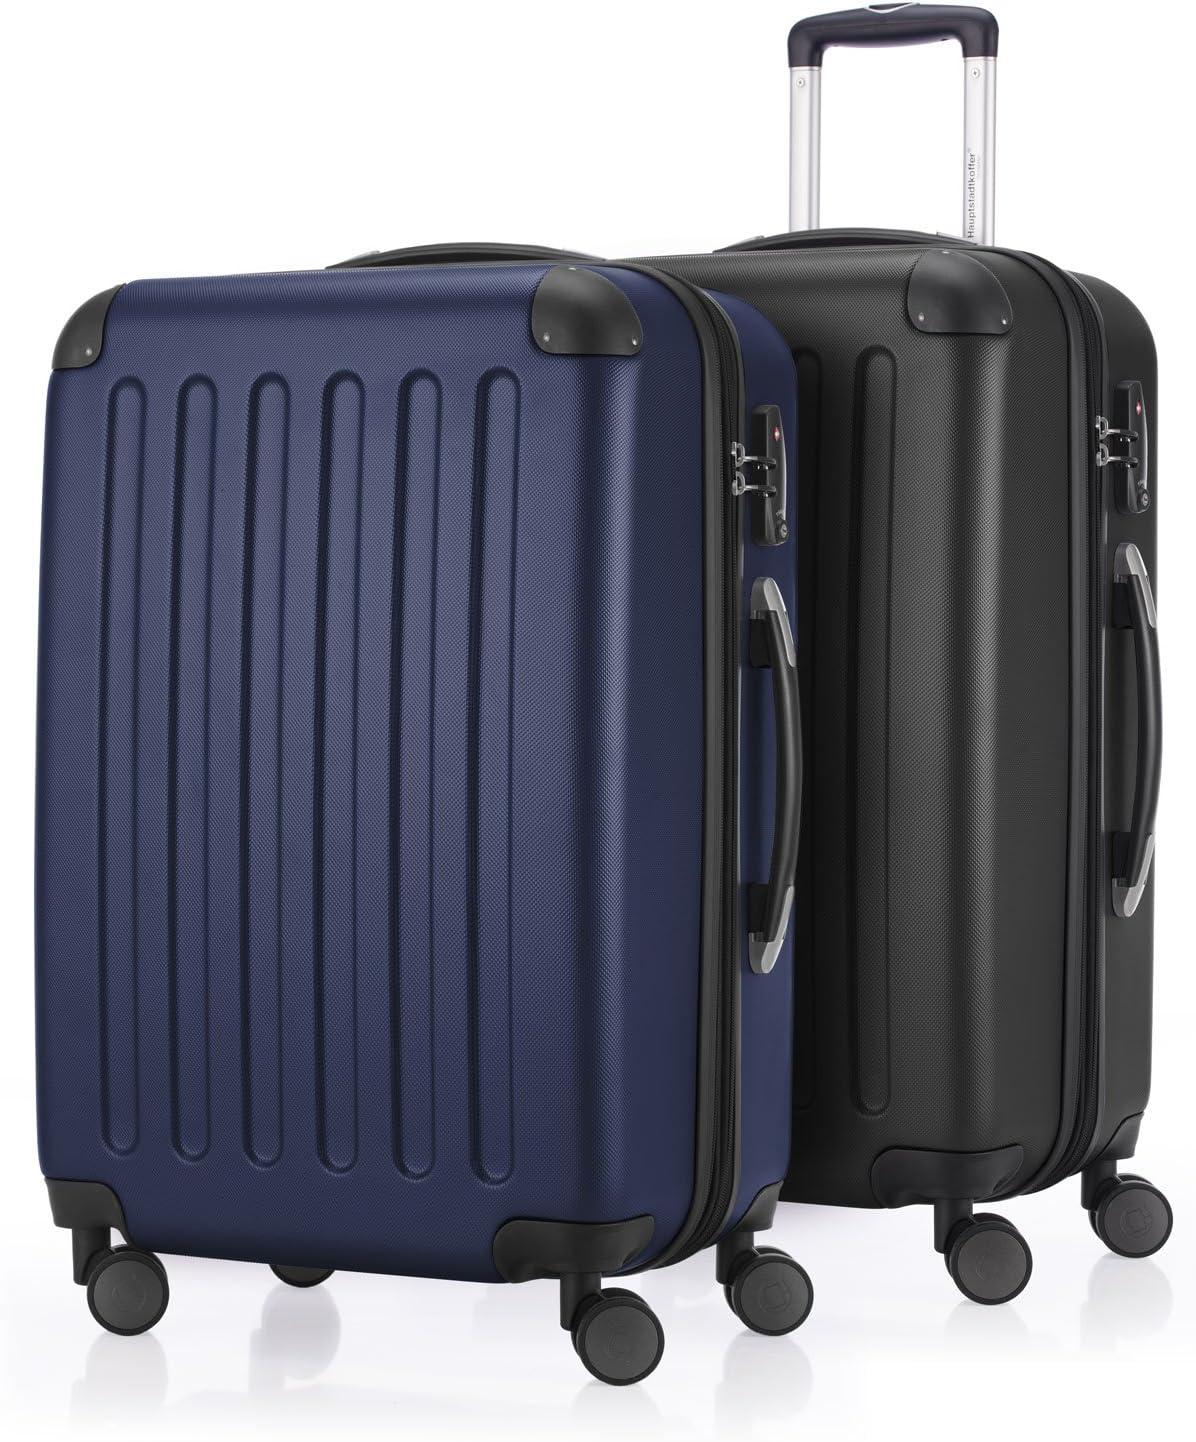 HAUPTSTADTKOFFER  Juegos de maletas, 65 cm, 82 L, Negro / Azul marino